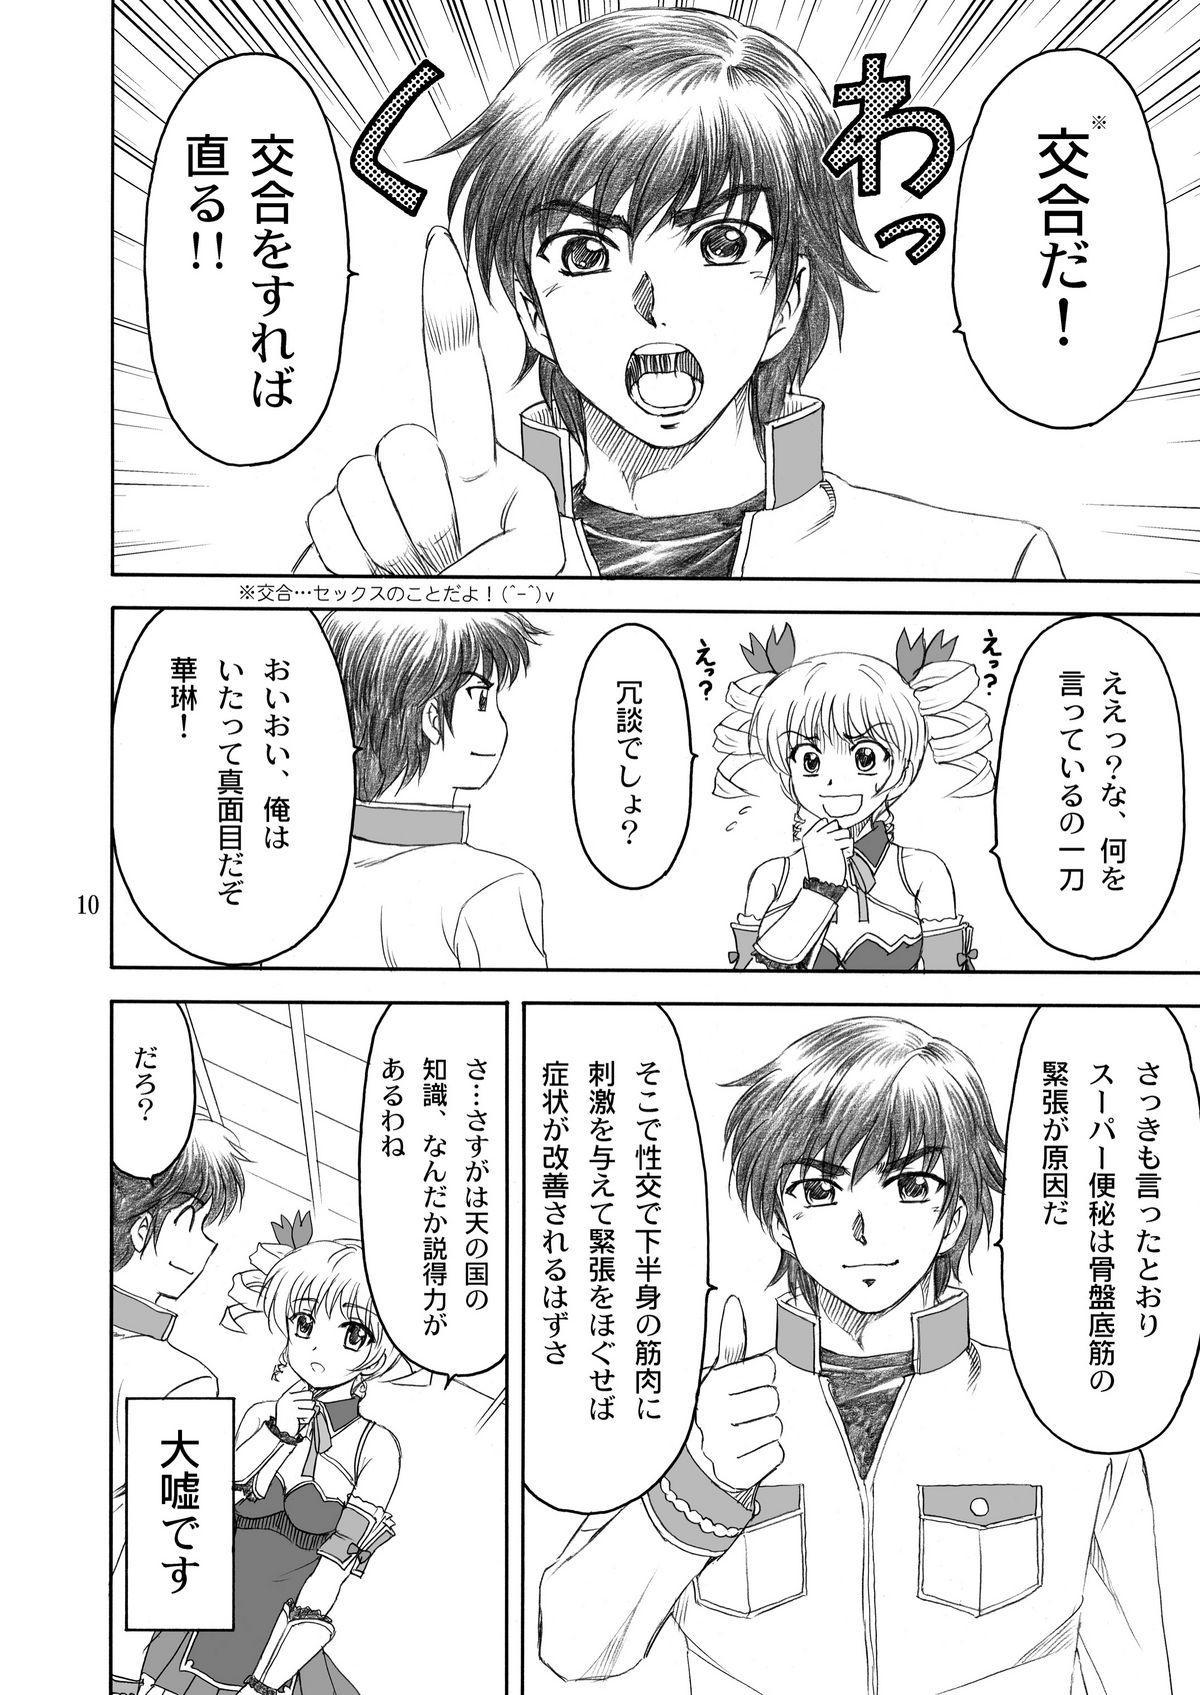 Karin-sama Otsuujiteki Jijou 9